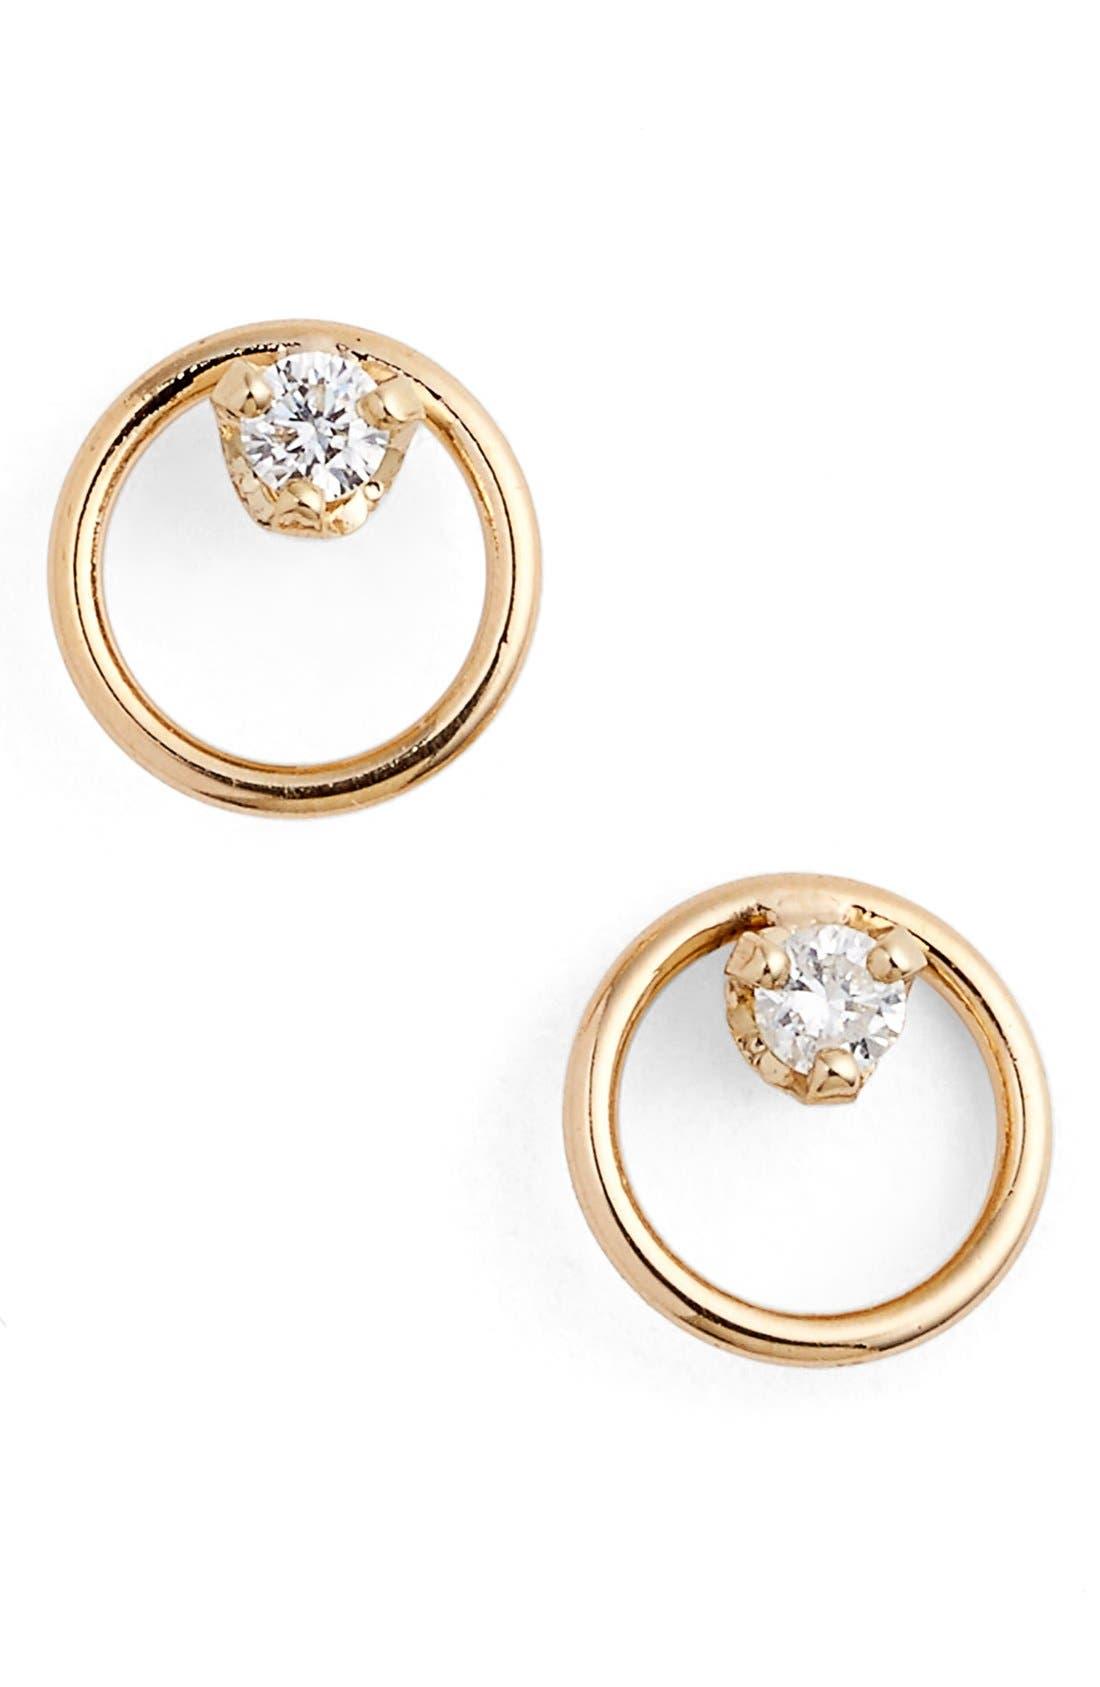 ZOË CHICCO, Diamond Circle Stud Earrings, Main thumbnail 1, color, YELLOW GOLD